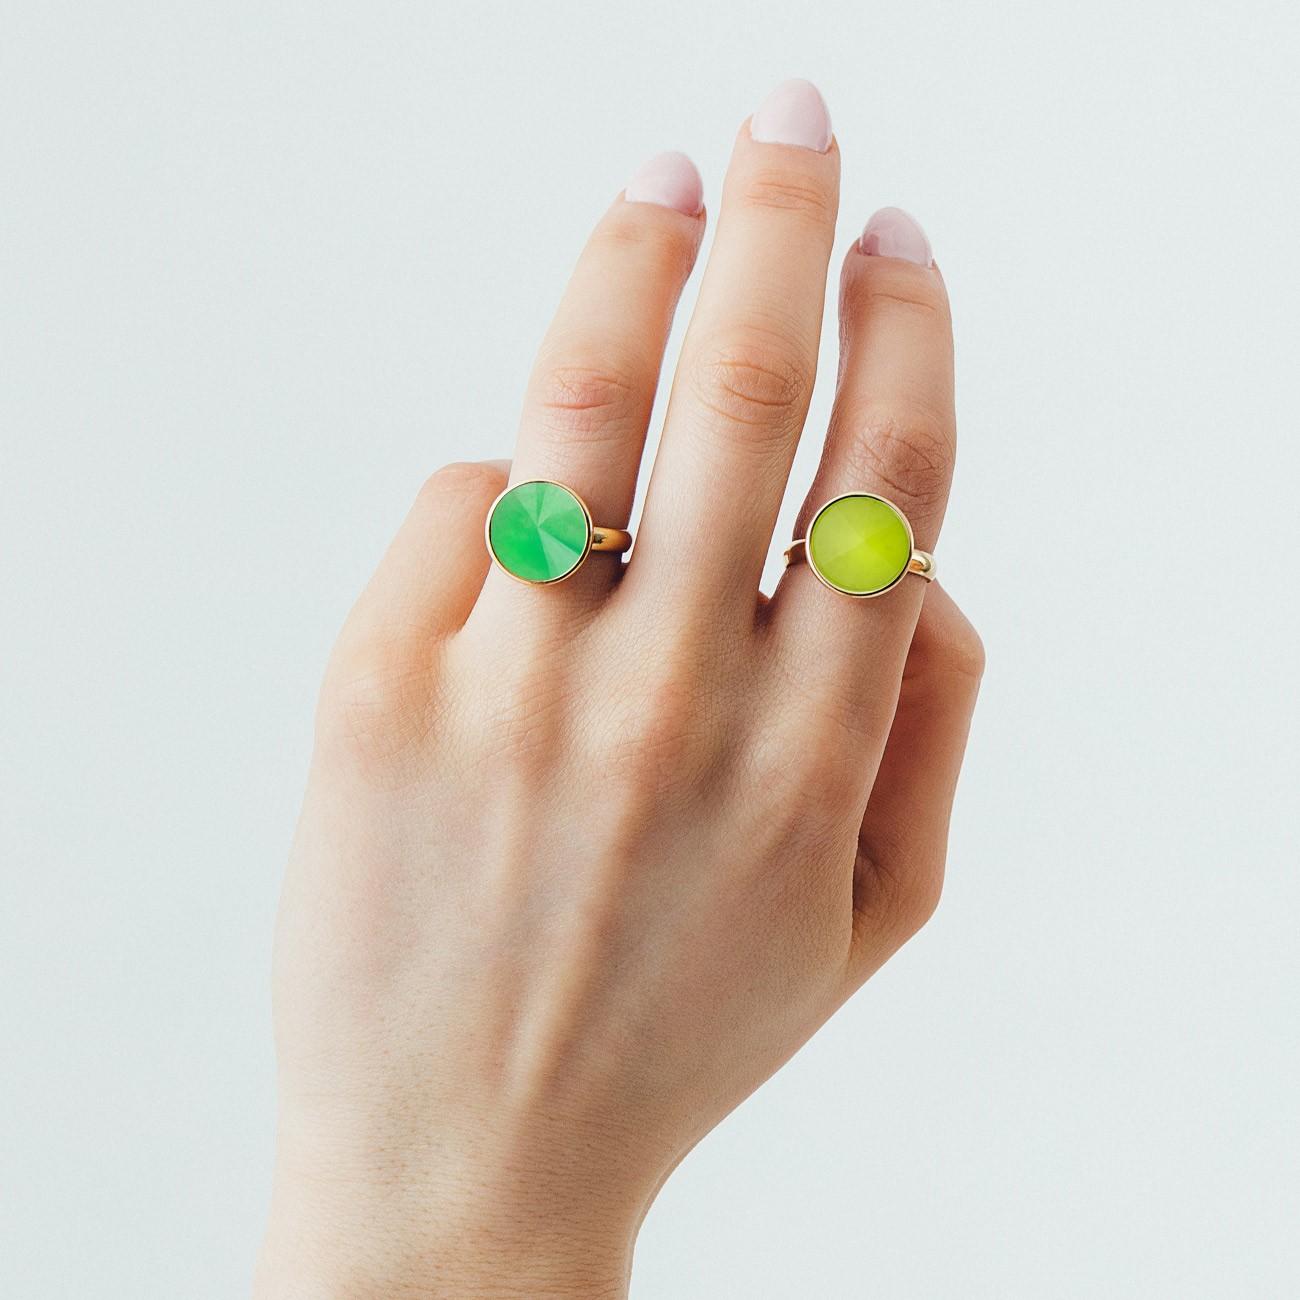 Srebrny pierścionek kamień naturalny chryzopraz, srebro 925